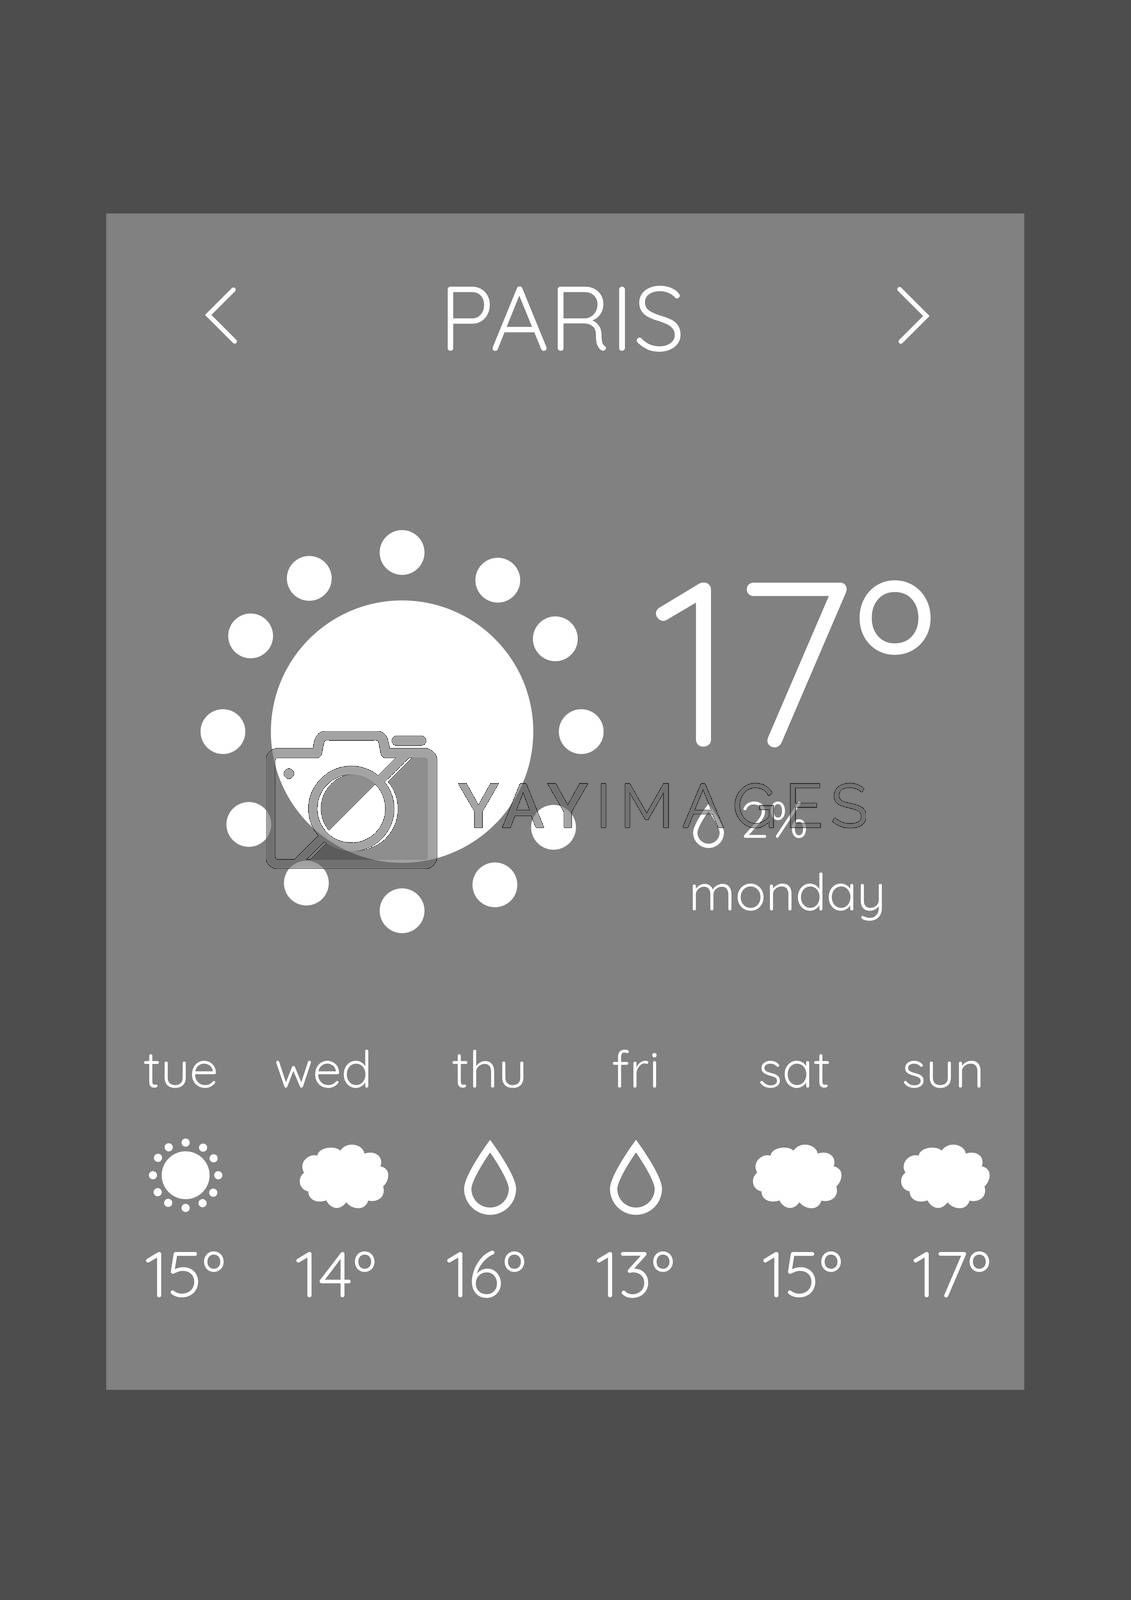 Weather forecast application interface by Wavebreakmedia